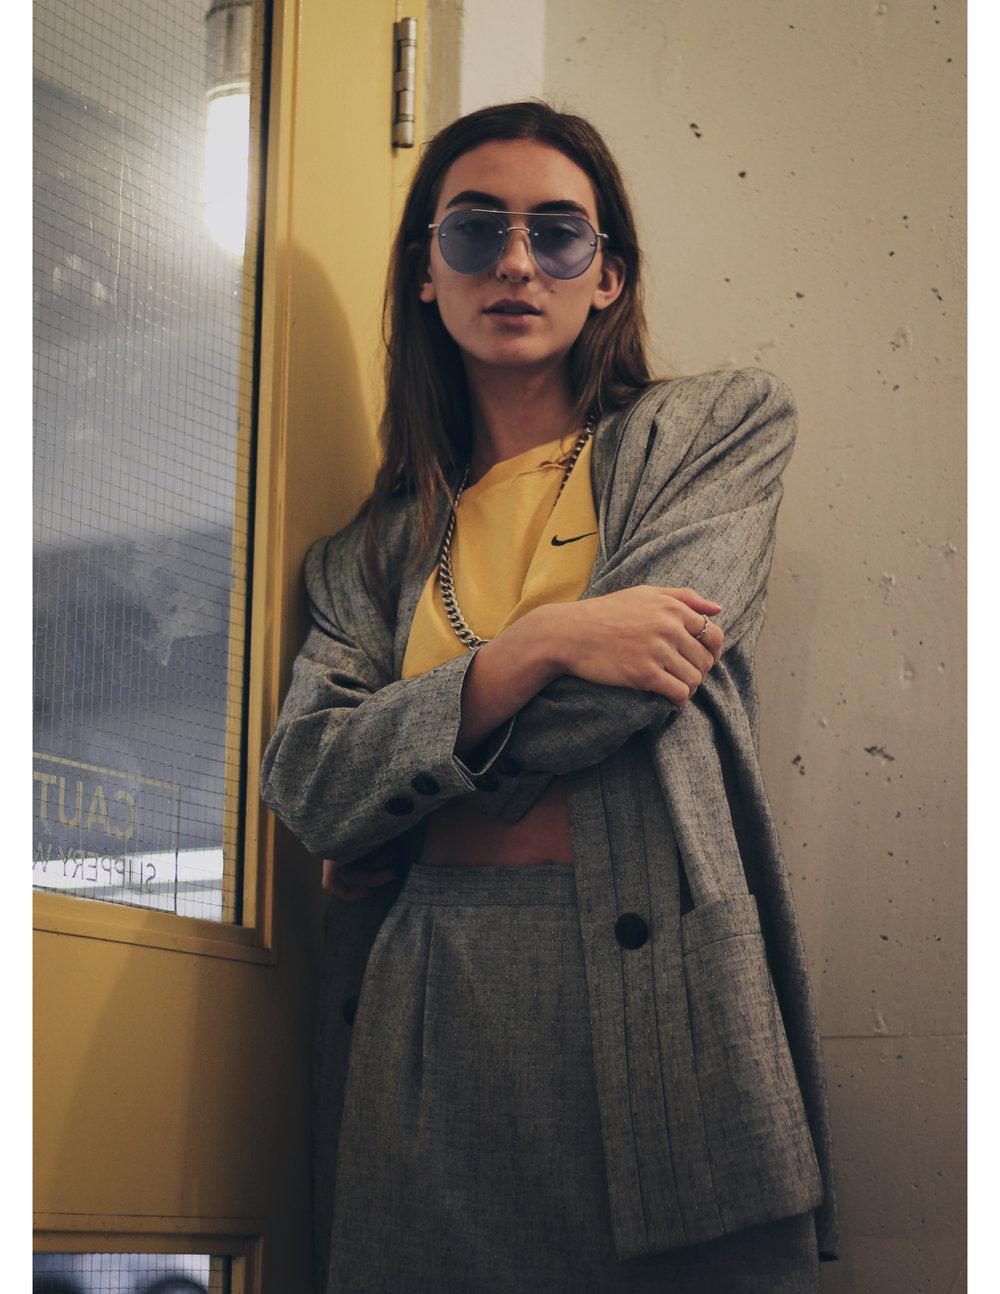 Manuela Wyszynski badlands vintage